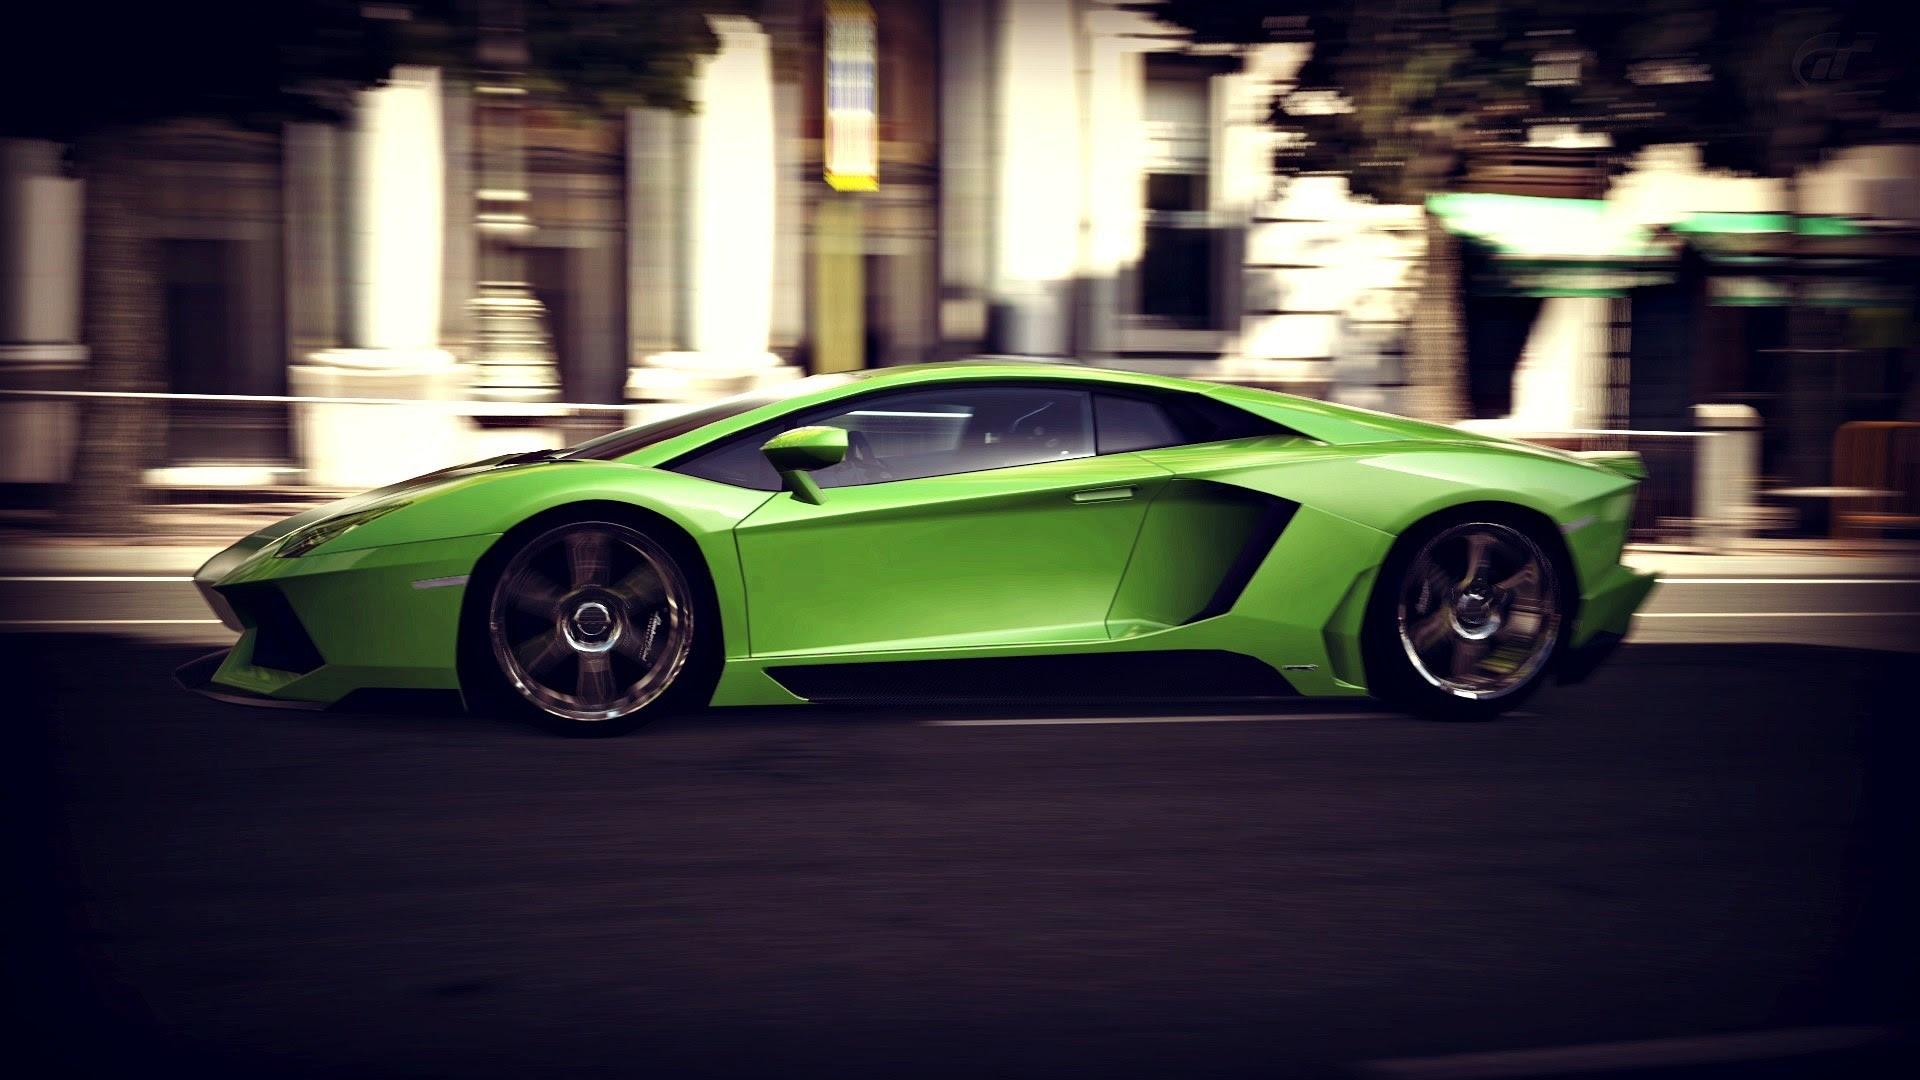 Lamborghini Aventador Game Race Wallpaper 1920x1080 9407